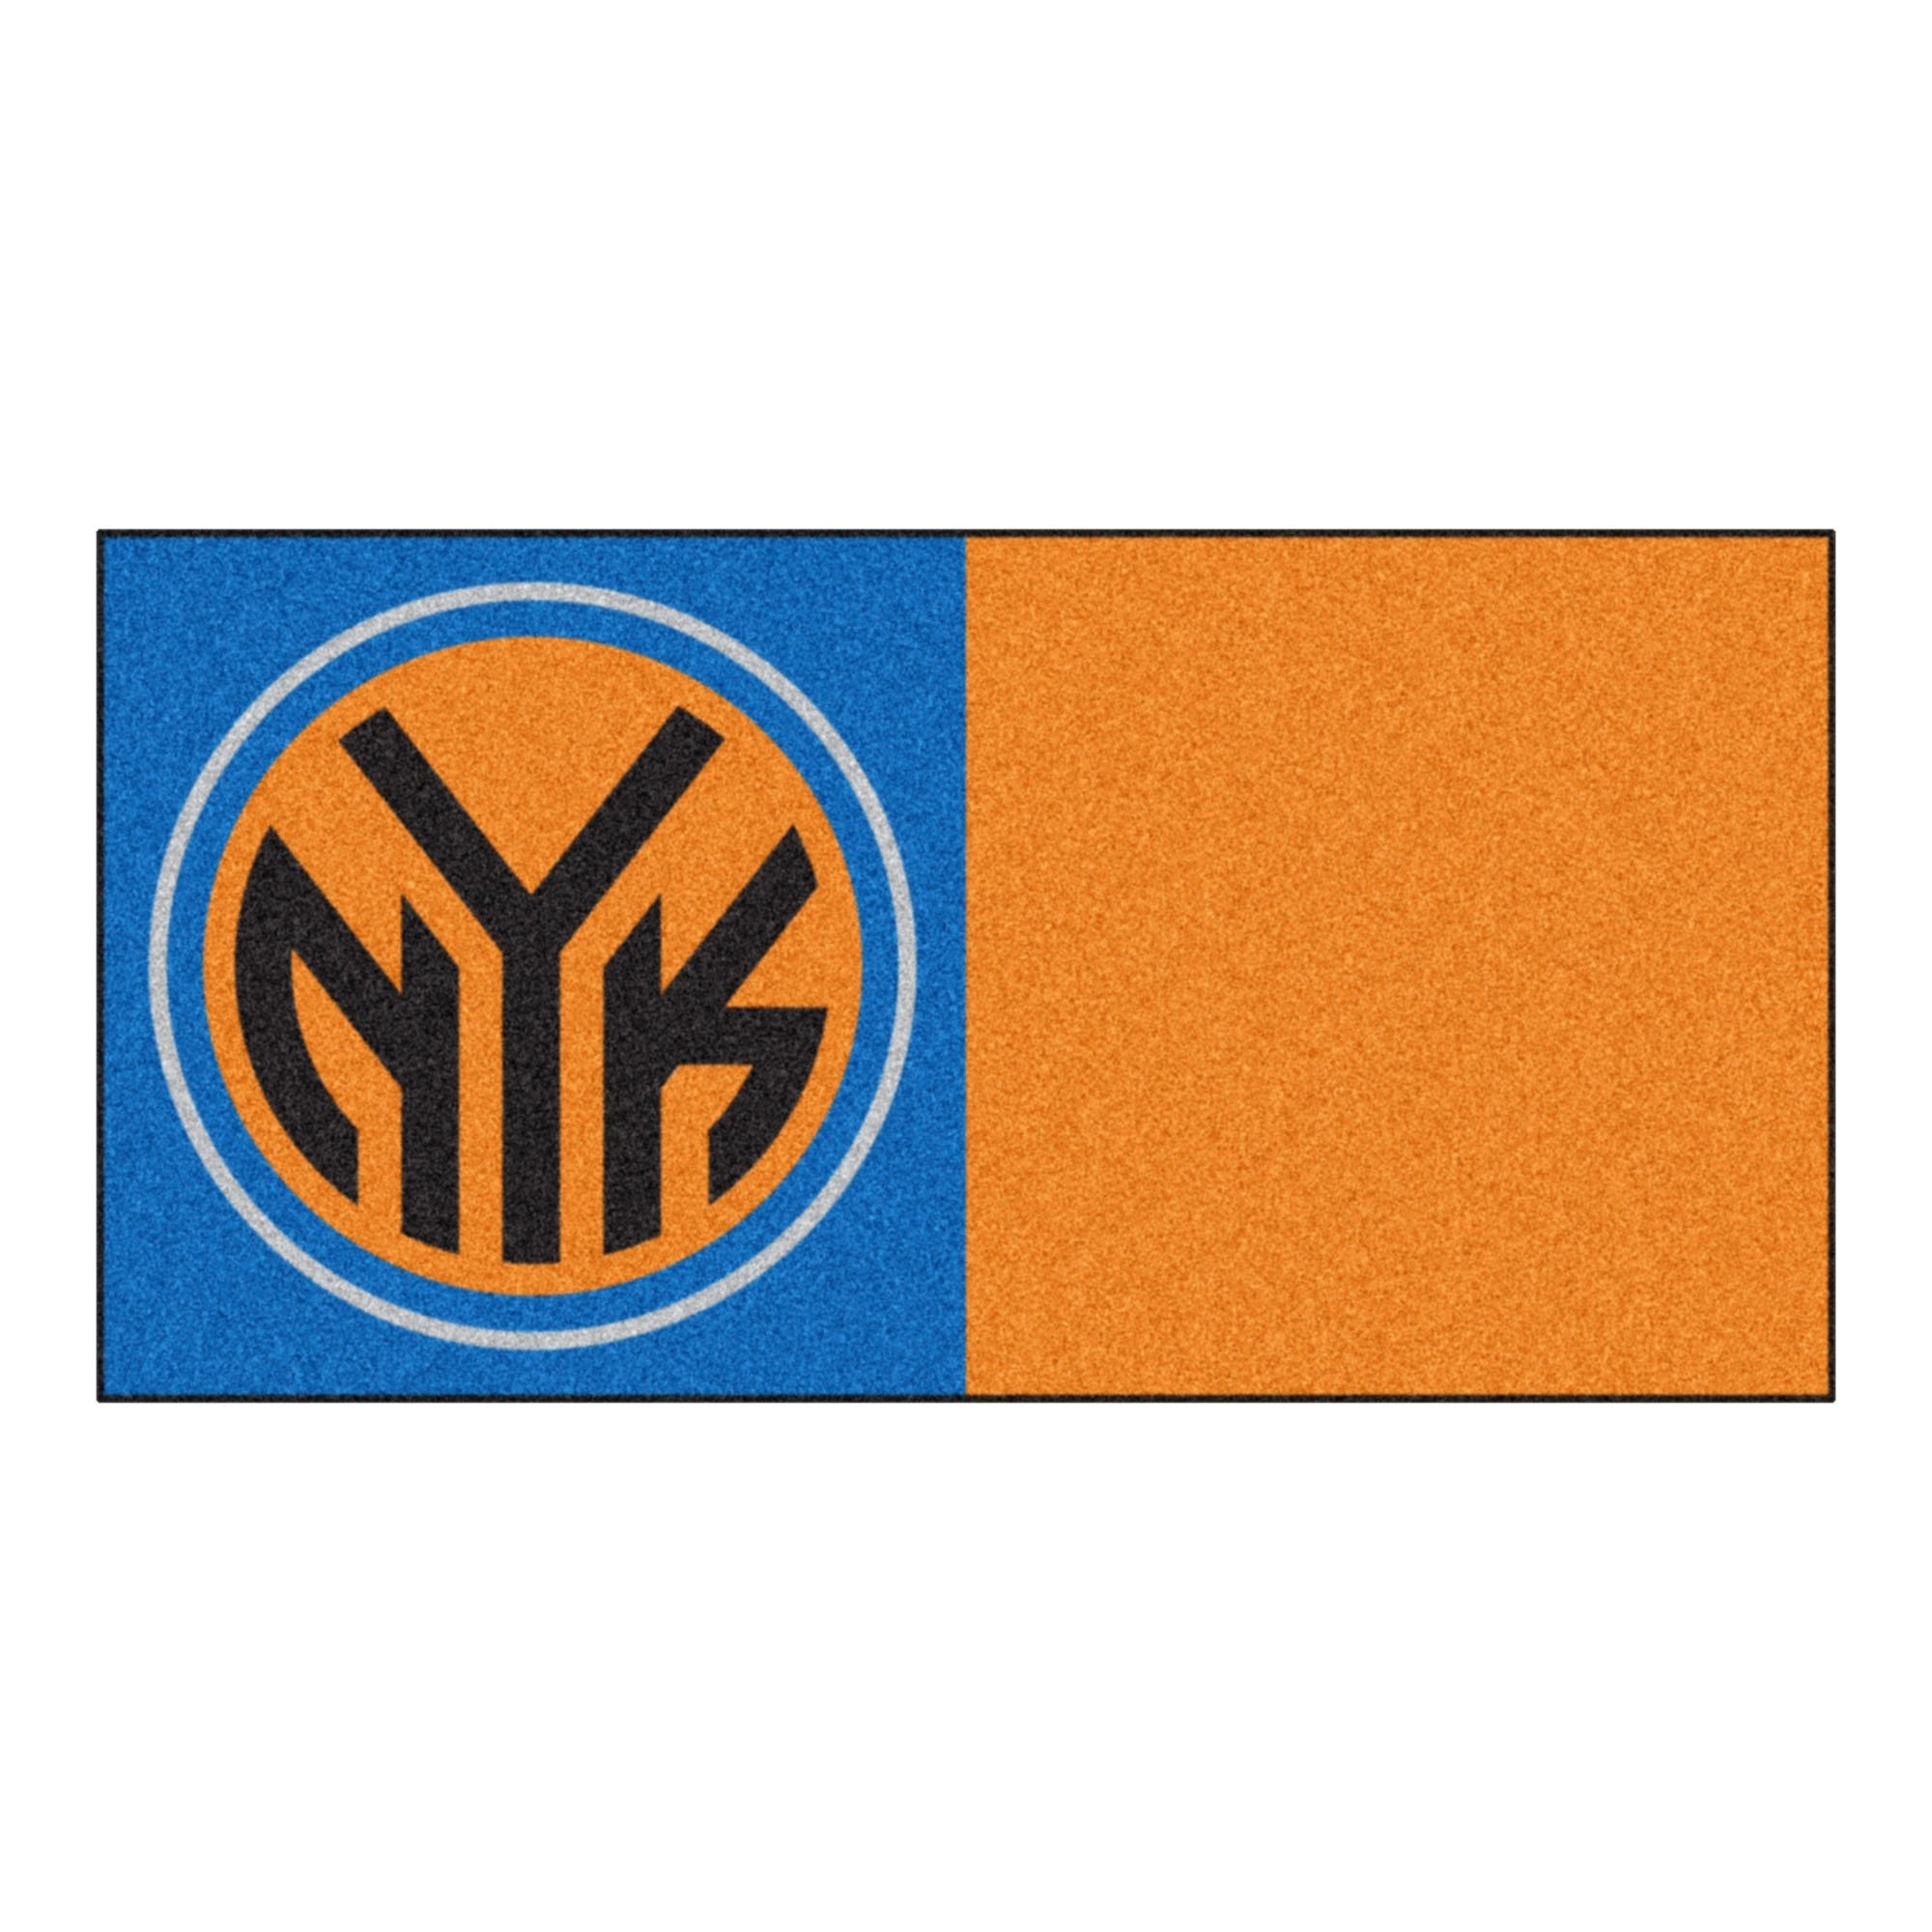 FANMATS NBA New York Knicks Nylon Face Team Carpet Tiles